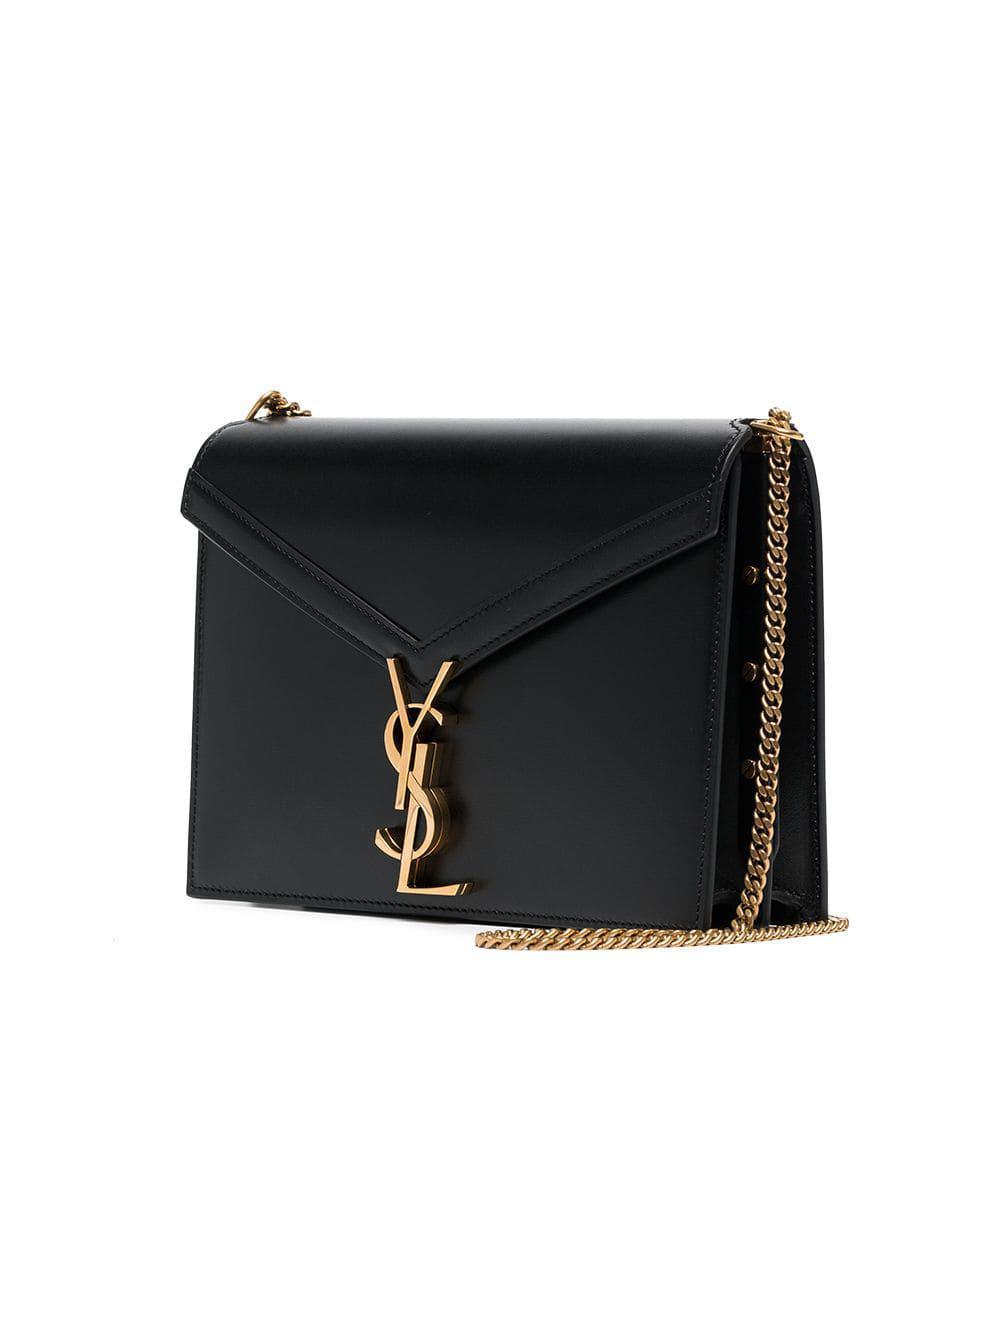 64ca3cb23fca Saint Laurent - Black Marceau Logo Clasp Leather Bag - Lyst. View  fullscreen. SAINT LAURENT Large Envelope Monogram Bag